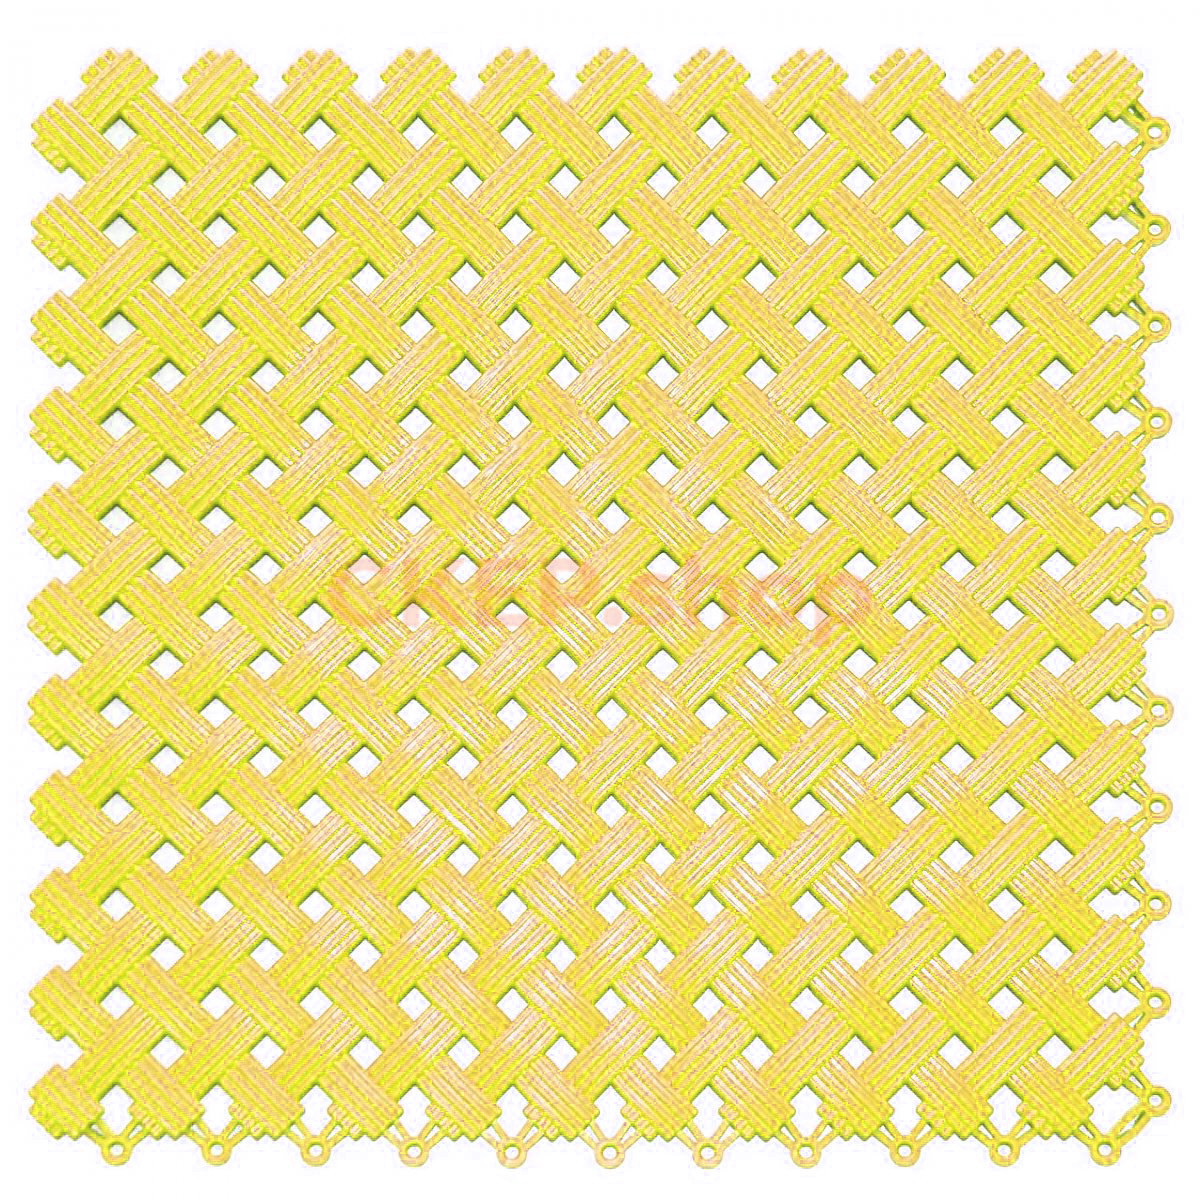 Покрытие модульное Аква, 340х340х9 мм, желтое